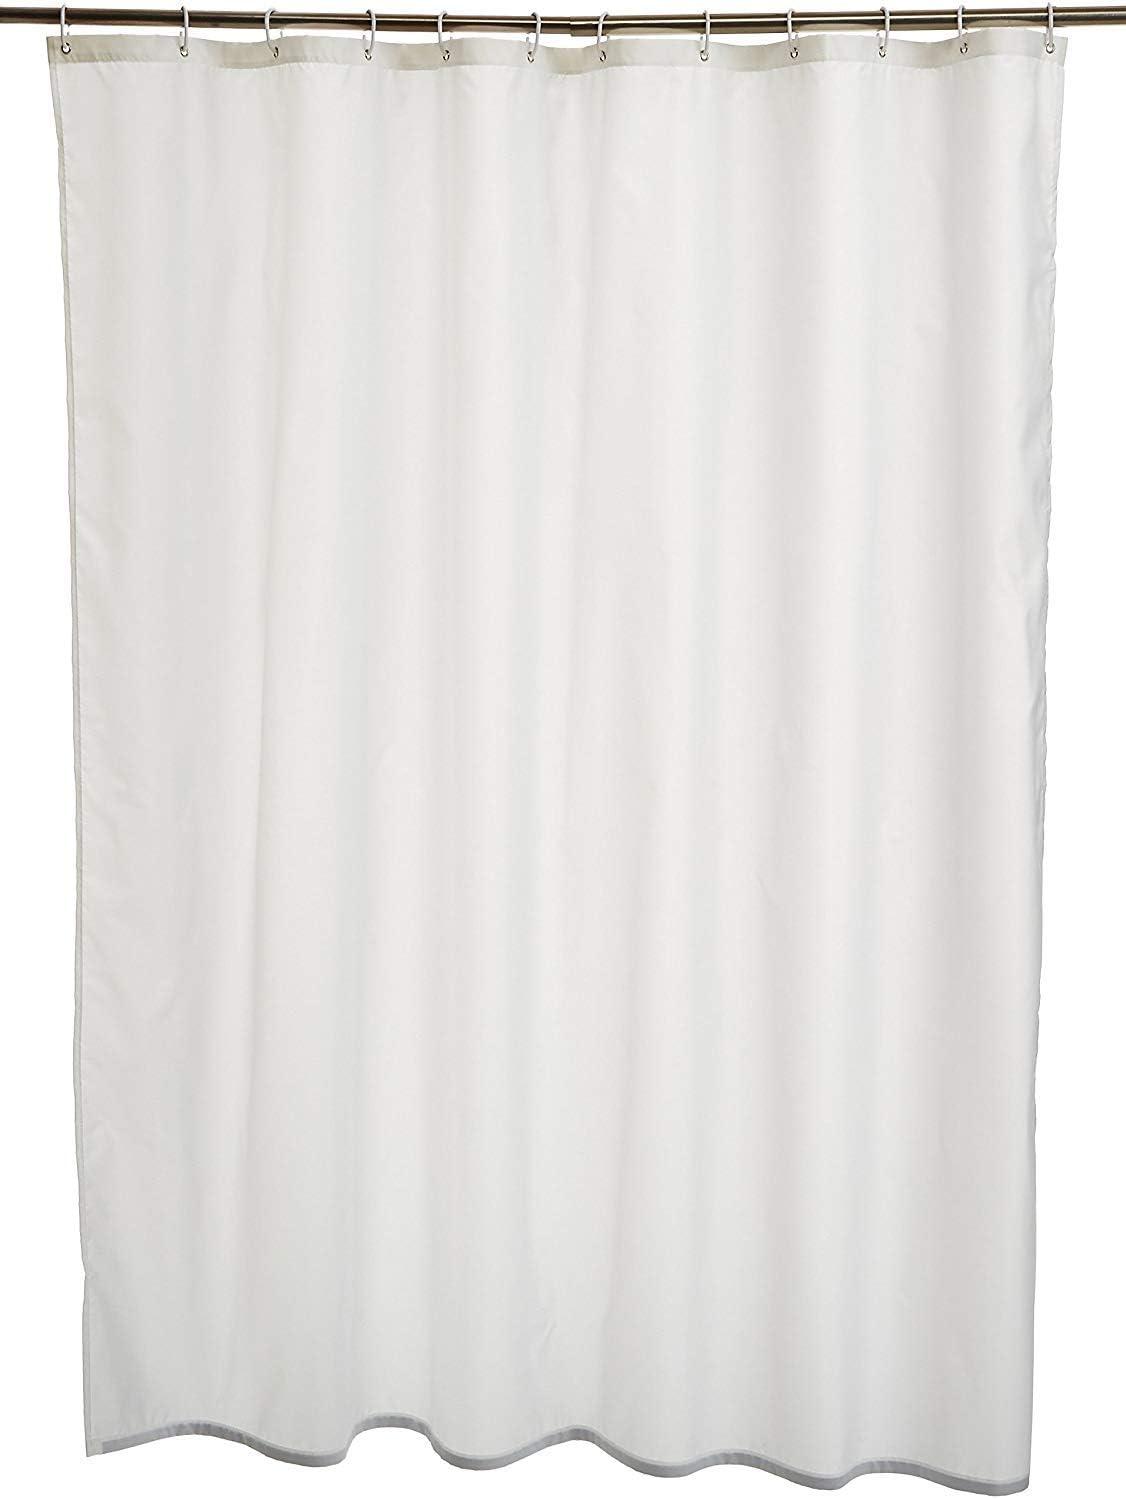 180cm Yardwe Tenda da Doccia Impermeabile Trasparente per Tenda da Doccia 120